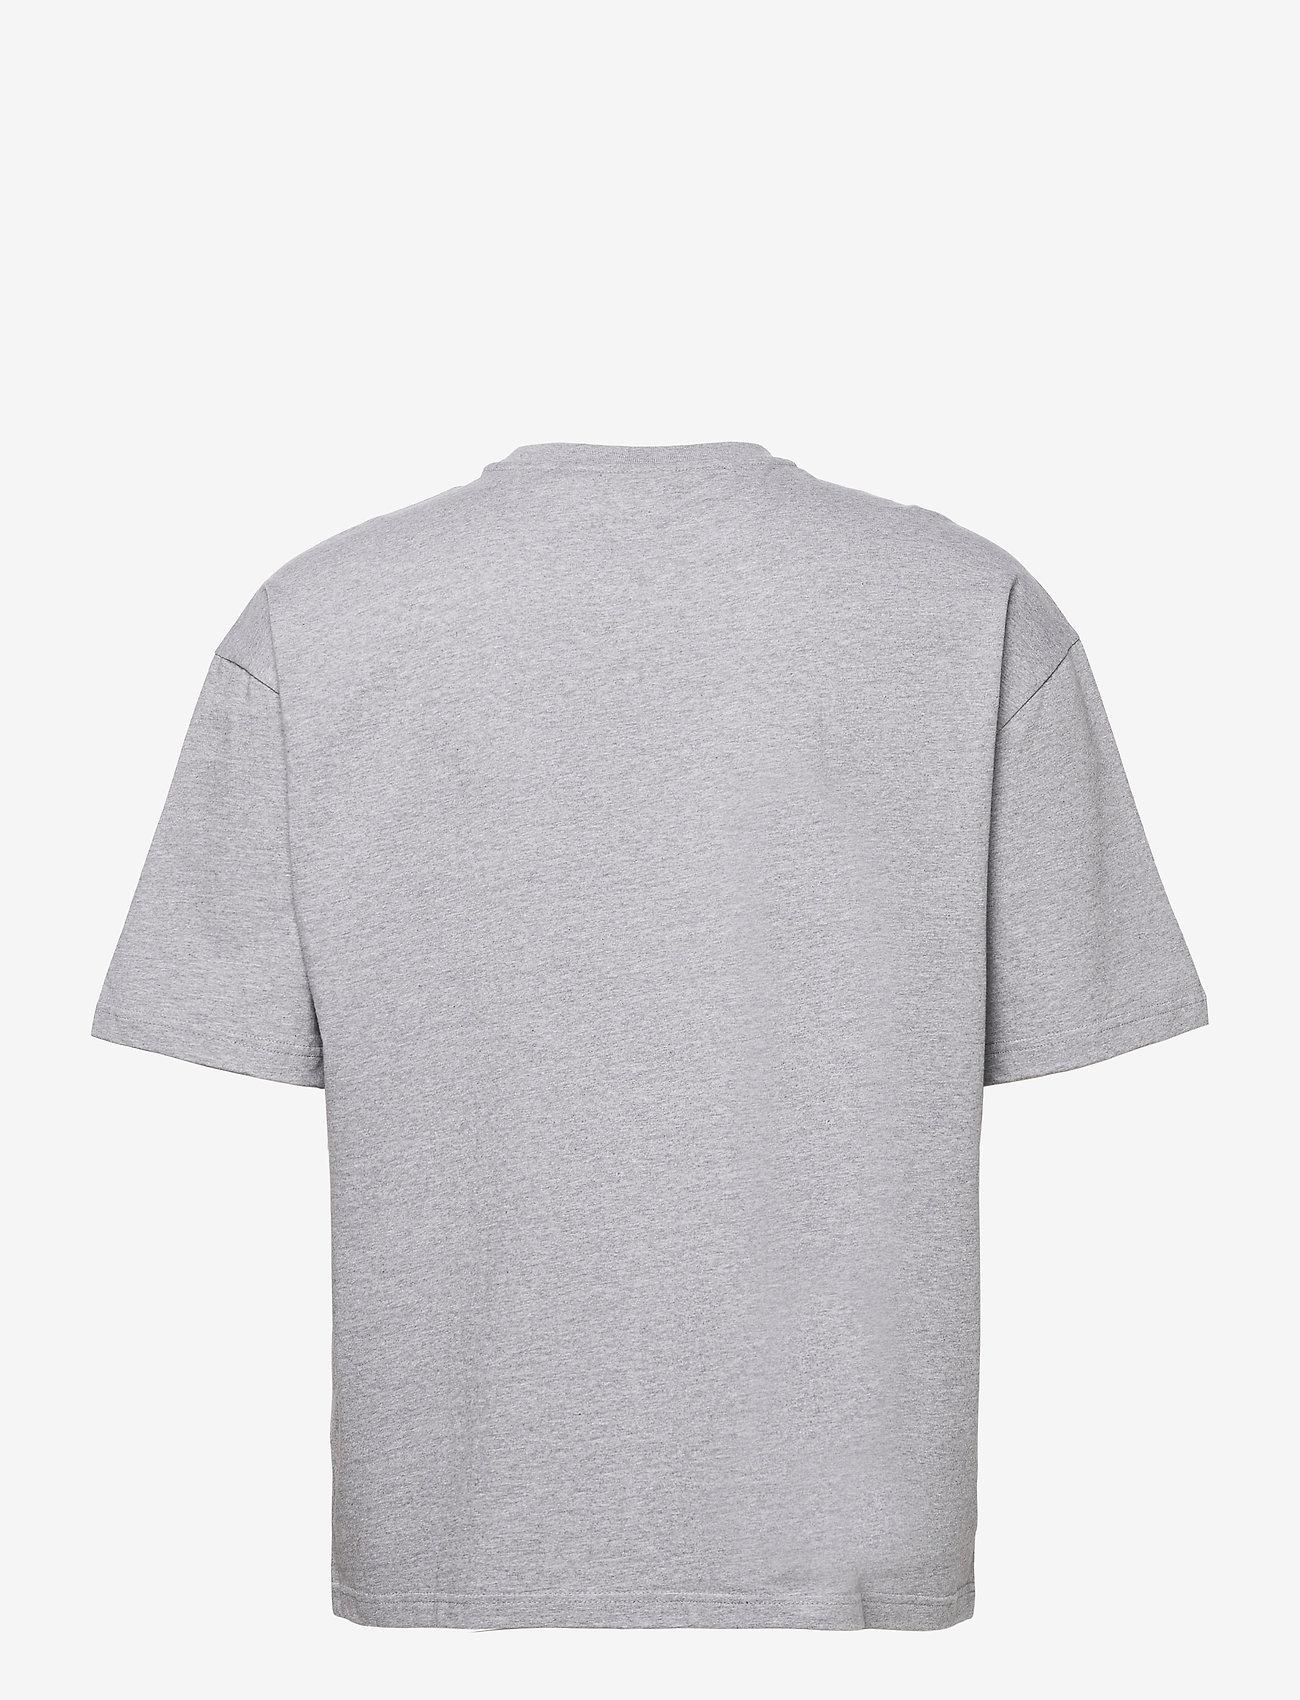 Daily Paper - Kengra - t-shirts à manches courtes - grey melange - 1